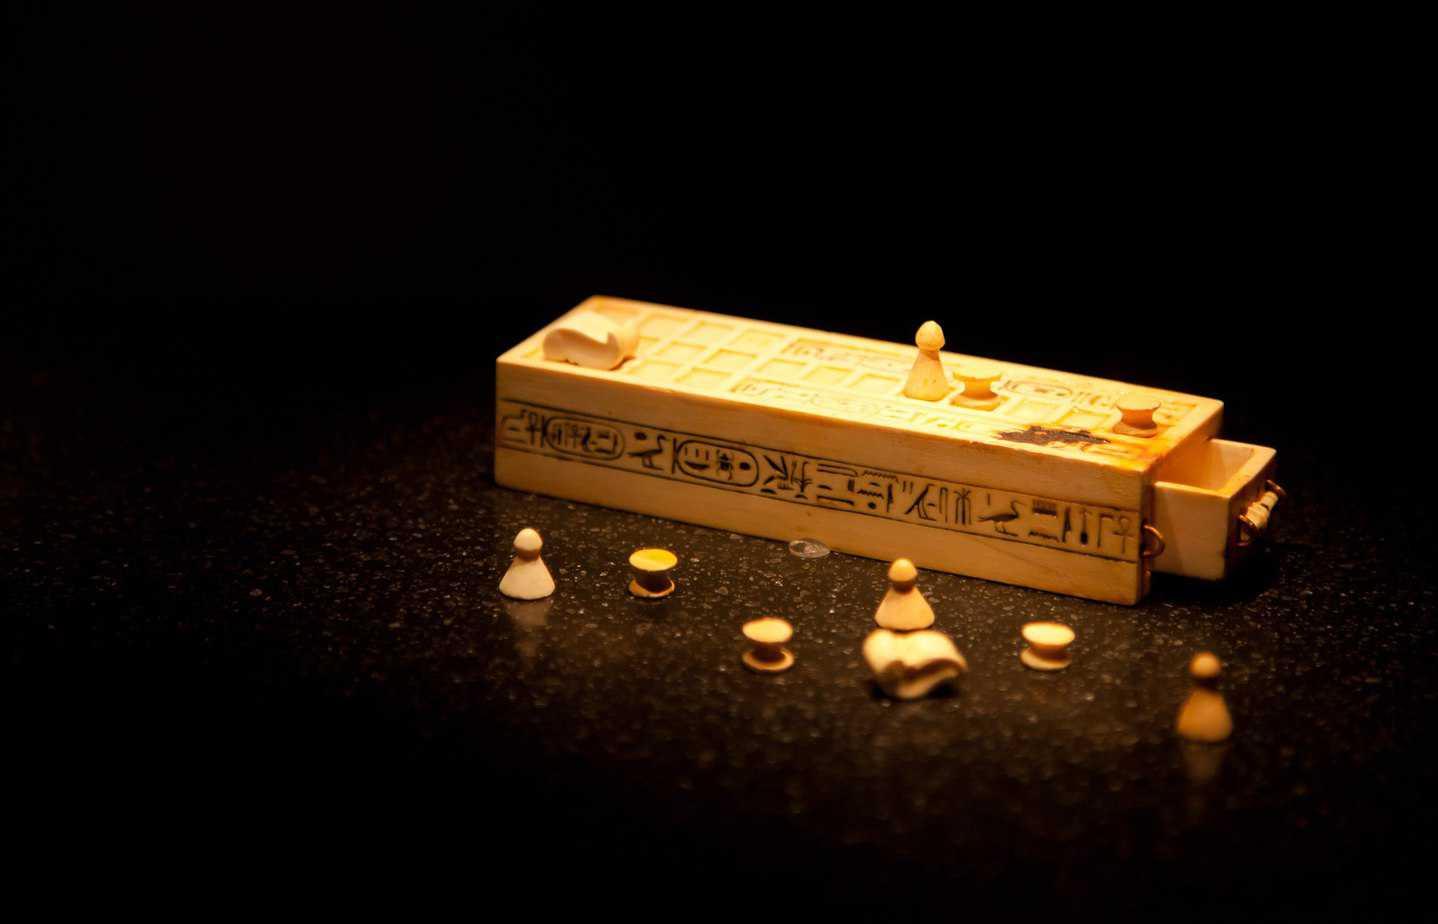 Senet Board Game - History of Board Games